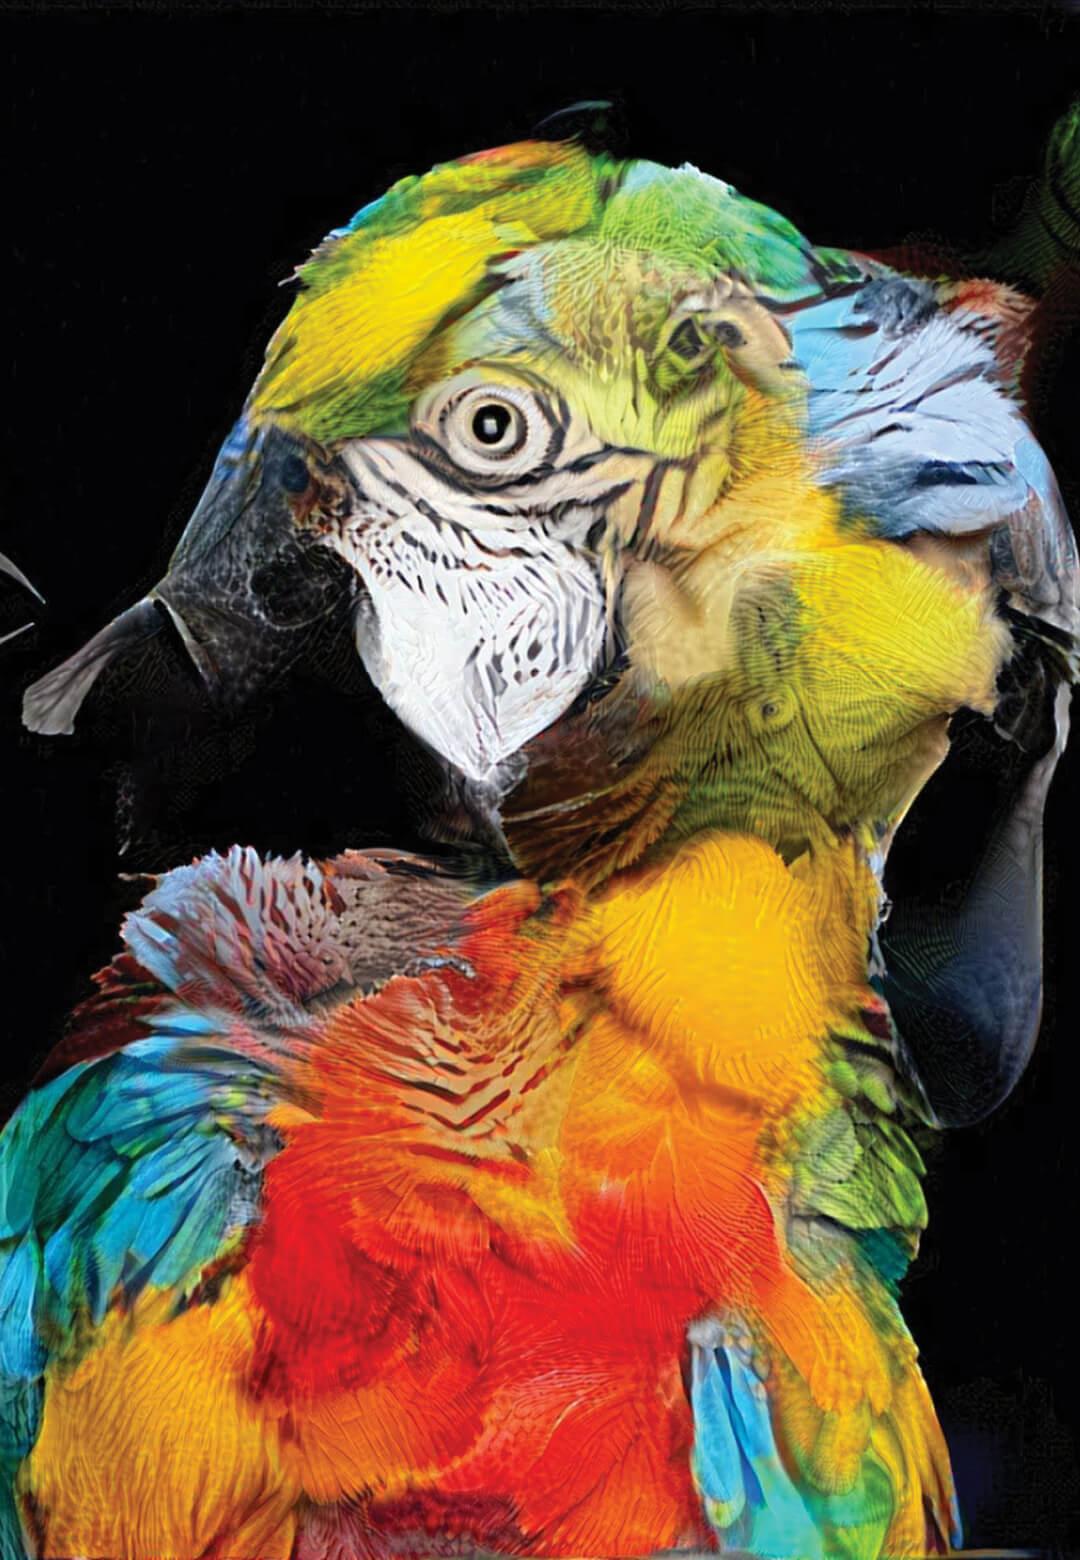 Realization, a blend of various avian forms | Sofia Crespo | STIRworld